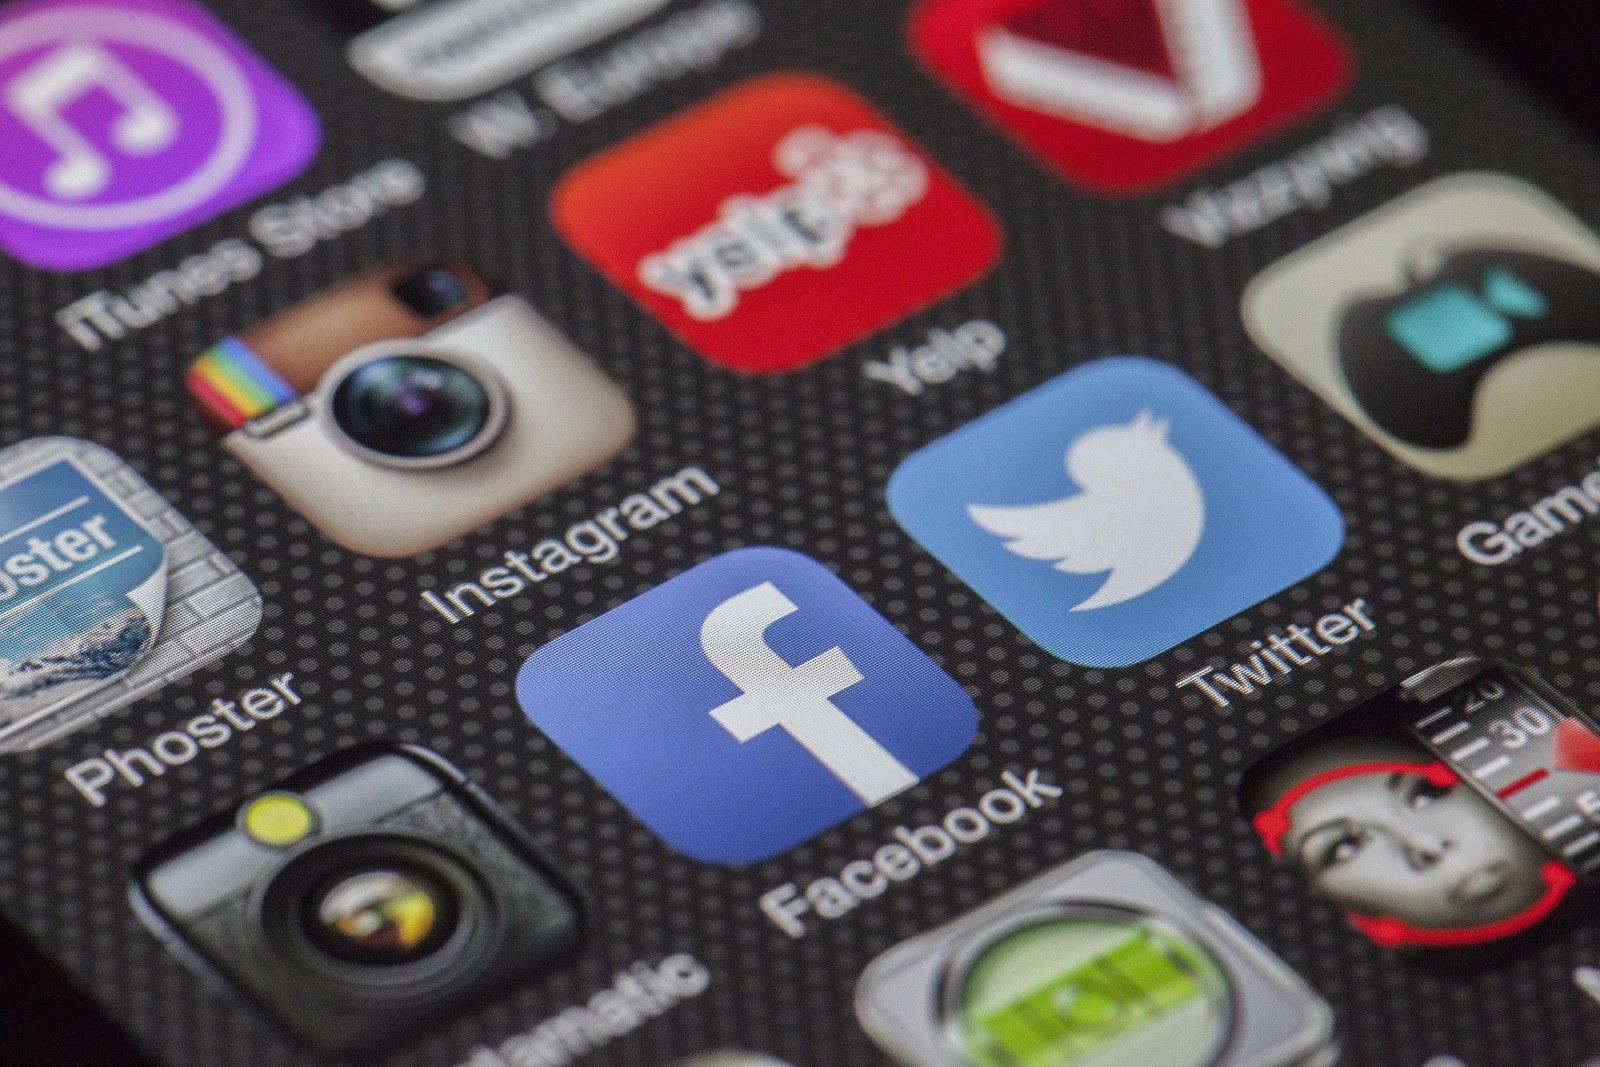 Top 5 iPhone Watermark Apps for Instagram